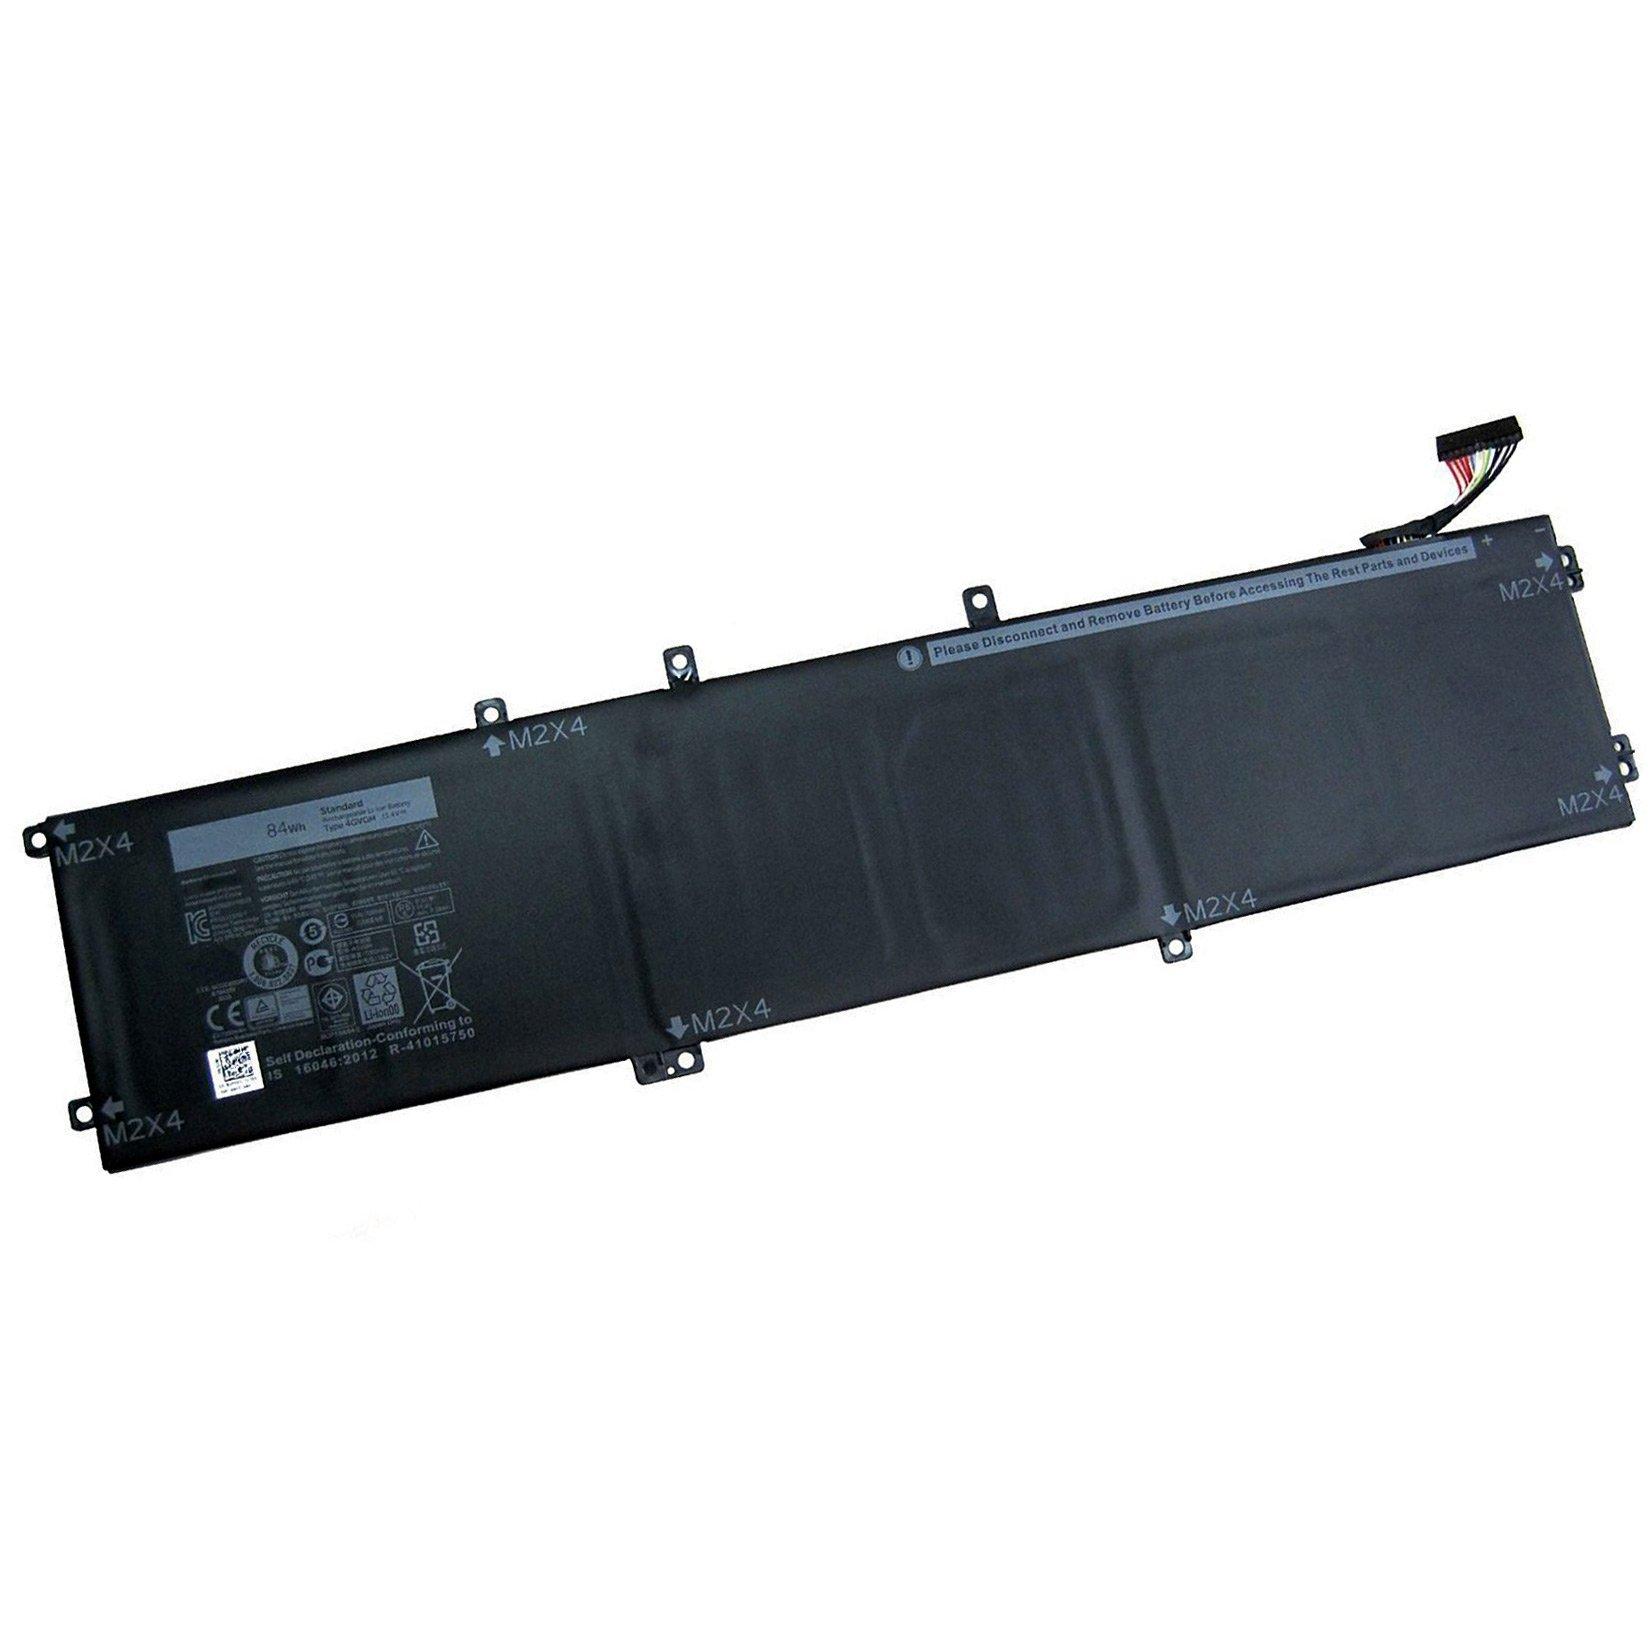 Dentsing 11.1V 84Wh 4GVGH 1P6KD Laptop Battery for Dell  XPS 15 9550